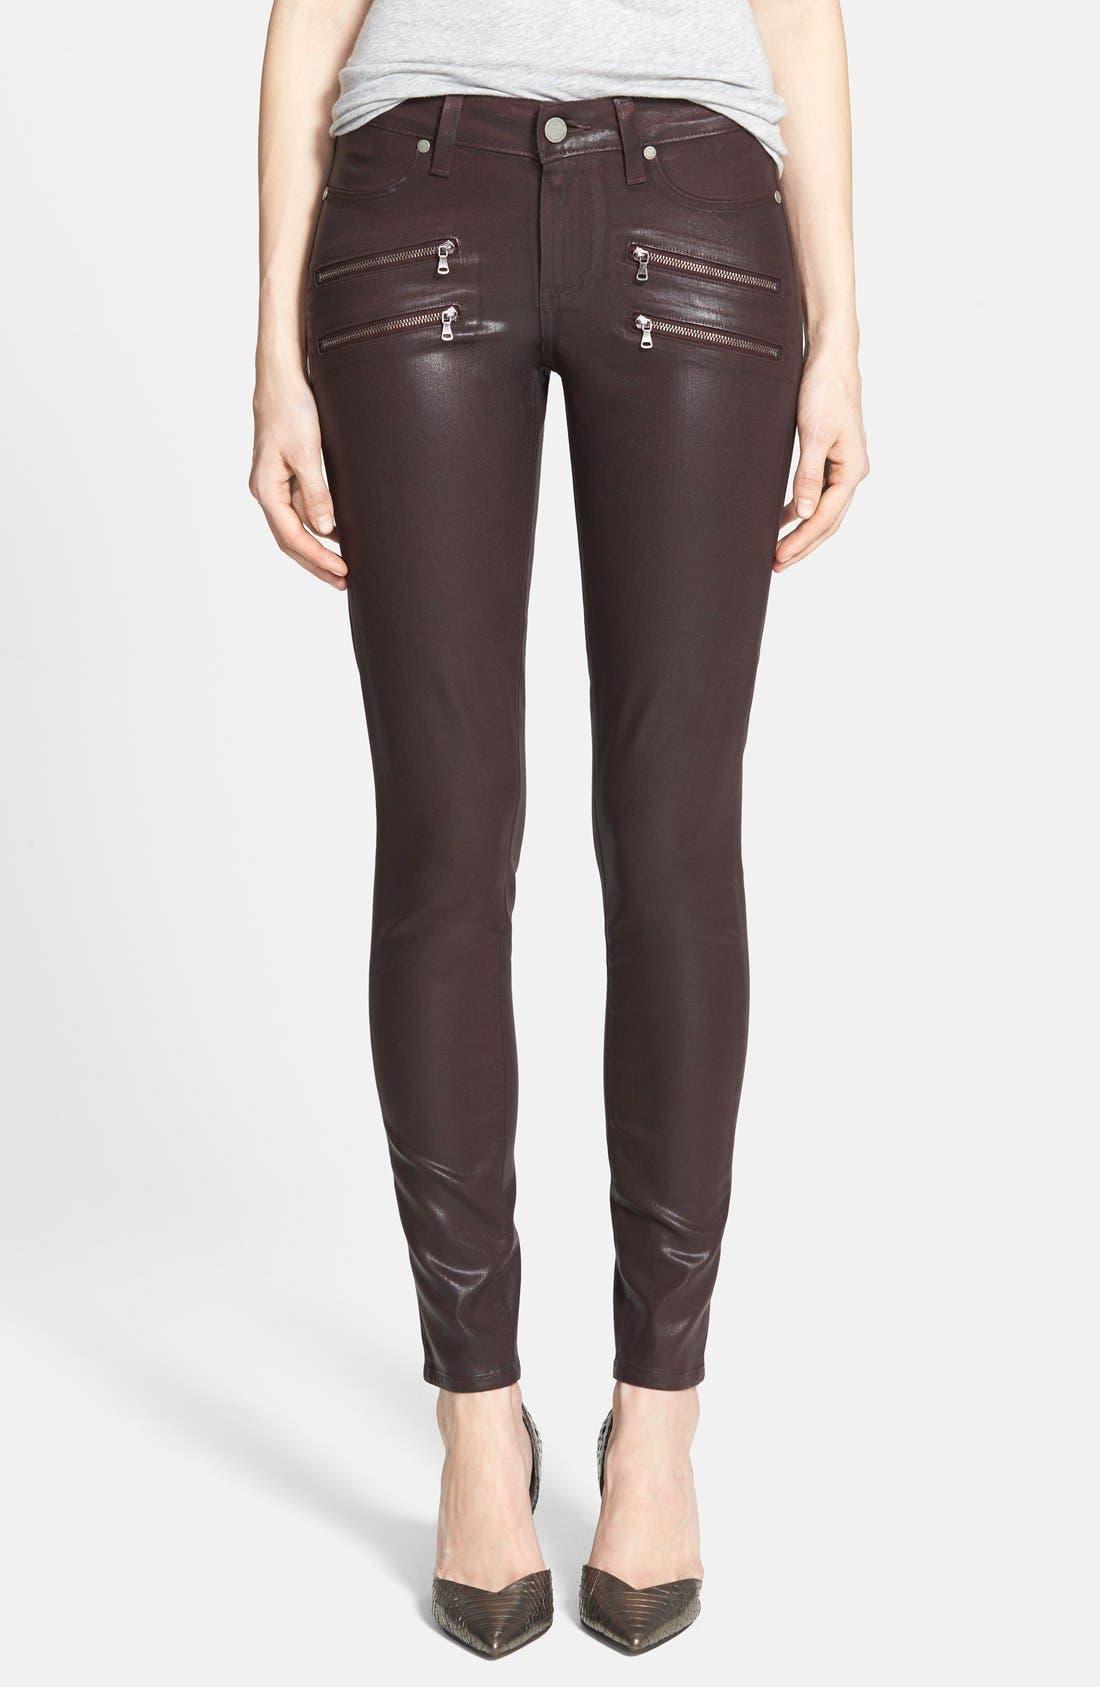 Alternate Image 1 Selected - Paige Denim 'Edgemont' Coated Skinny Jeans (Dark Mauve Pink)